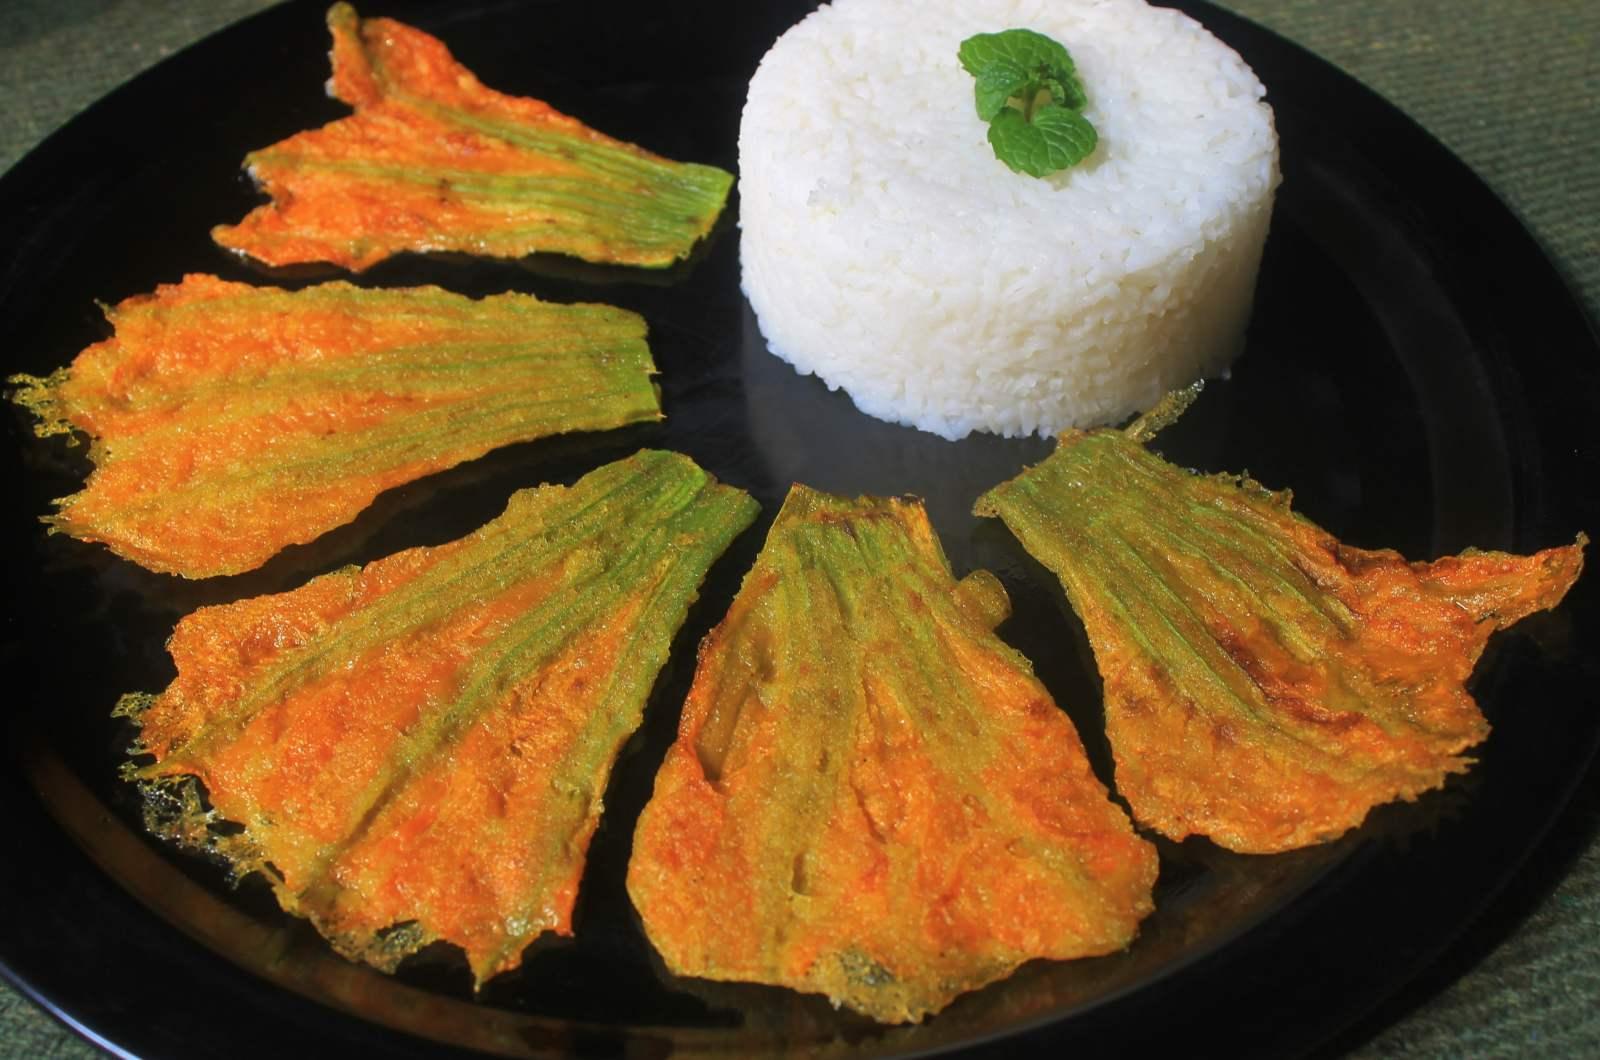 Oriya kakharu phula bhaja recipe pumpkin flower fritters by oriya kakharu phula bhaja recipe pumpkin flower fritters forumfinder Image collections